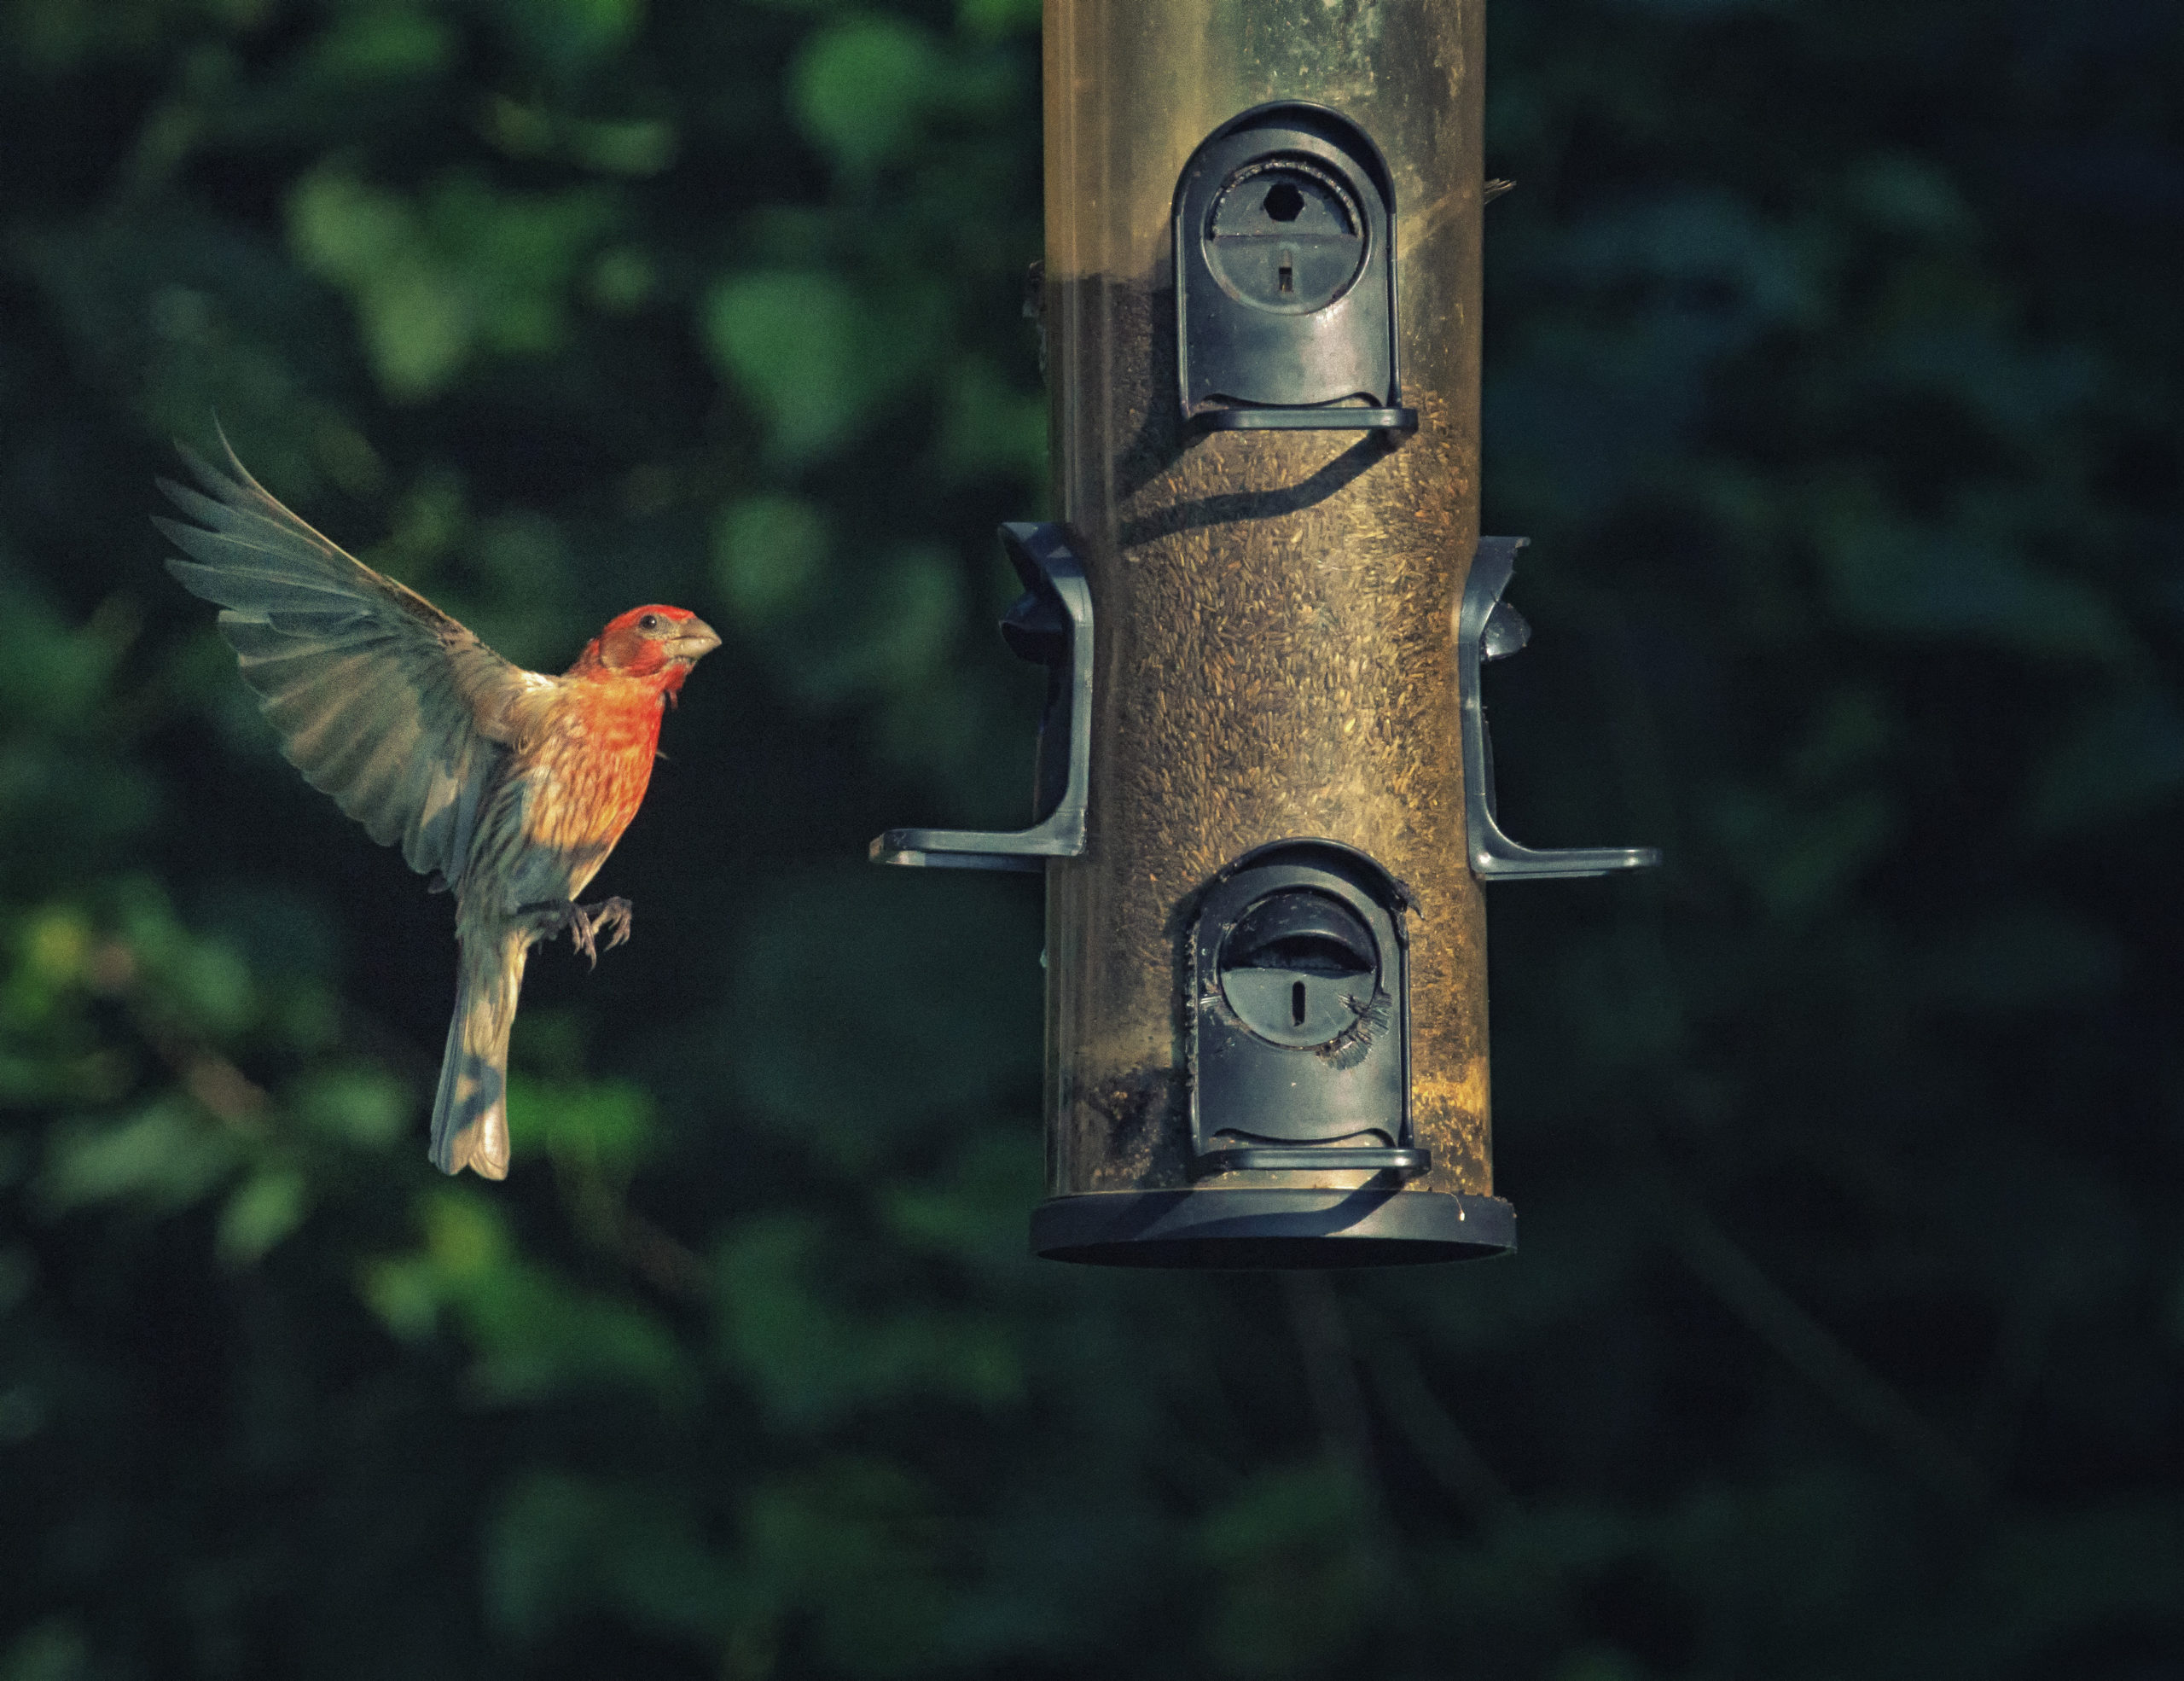 A house finch hovers near a tube feeder.